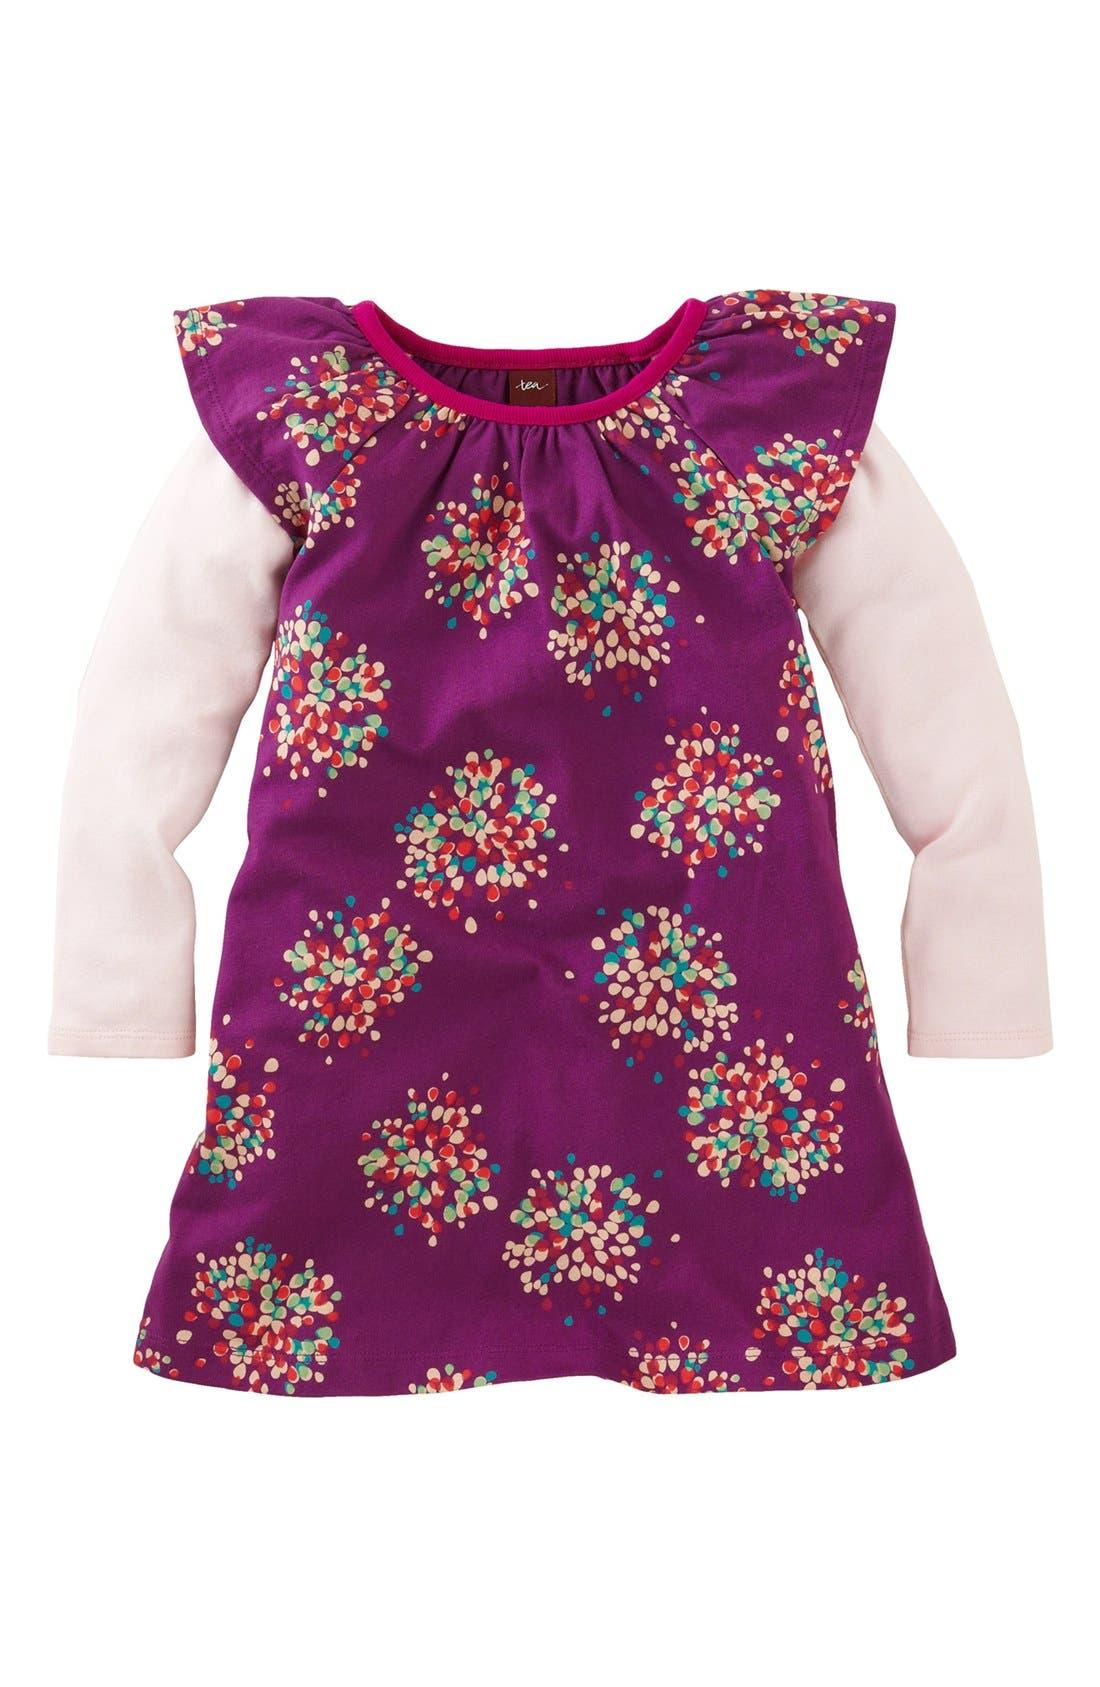 Alternate Image 1 Selected - Tea Collection 'Celebration' Dress (Baby Girls)